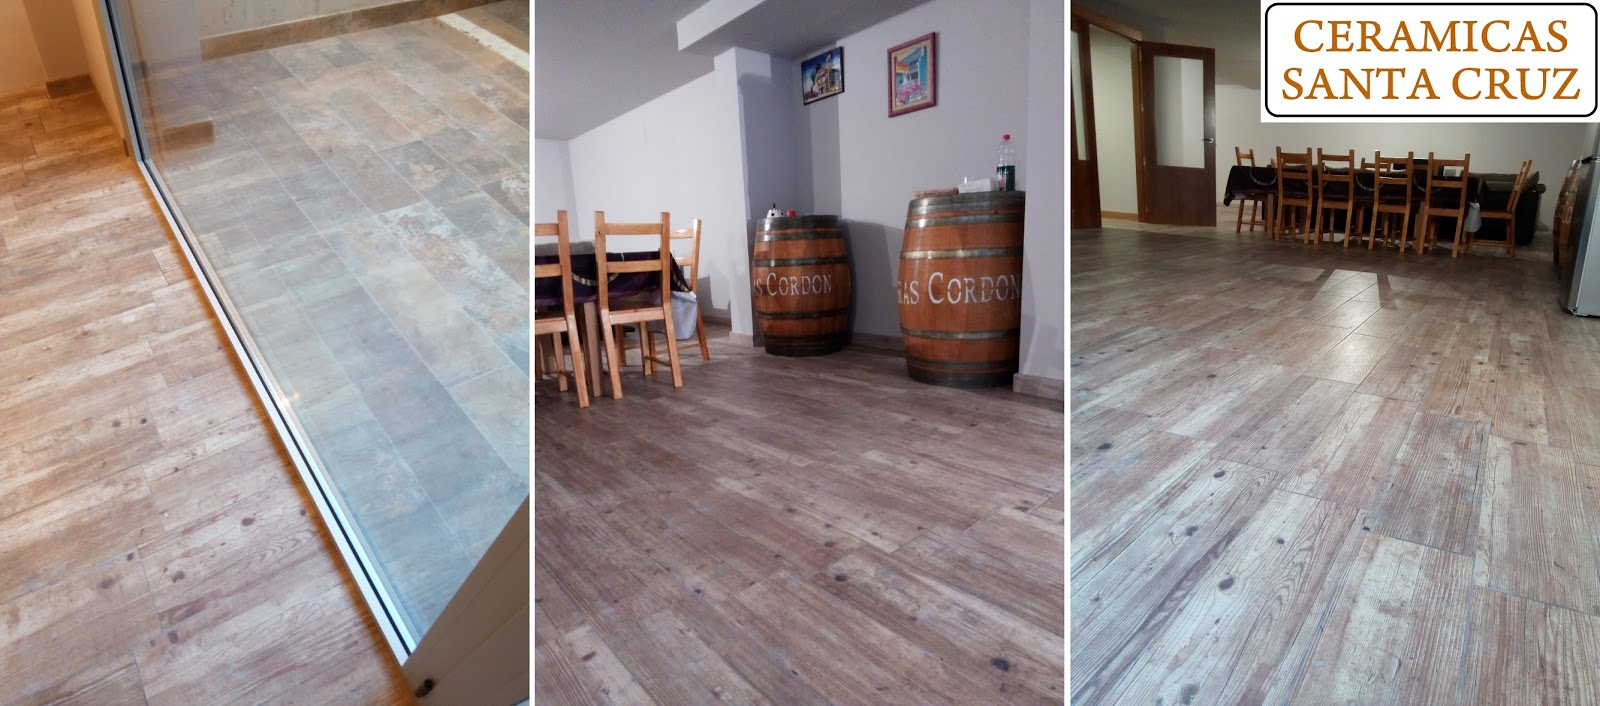 bodega con suelo de gres imitacin madera en tudela navarra - Baldosas Imitacion Madera